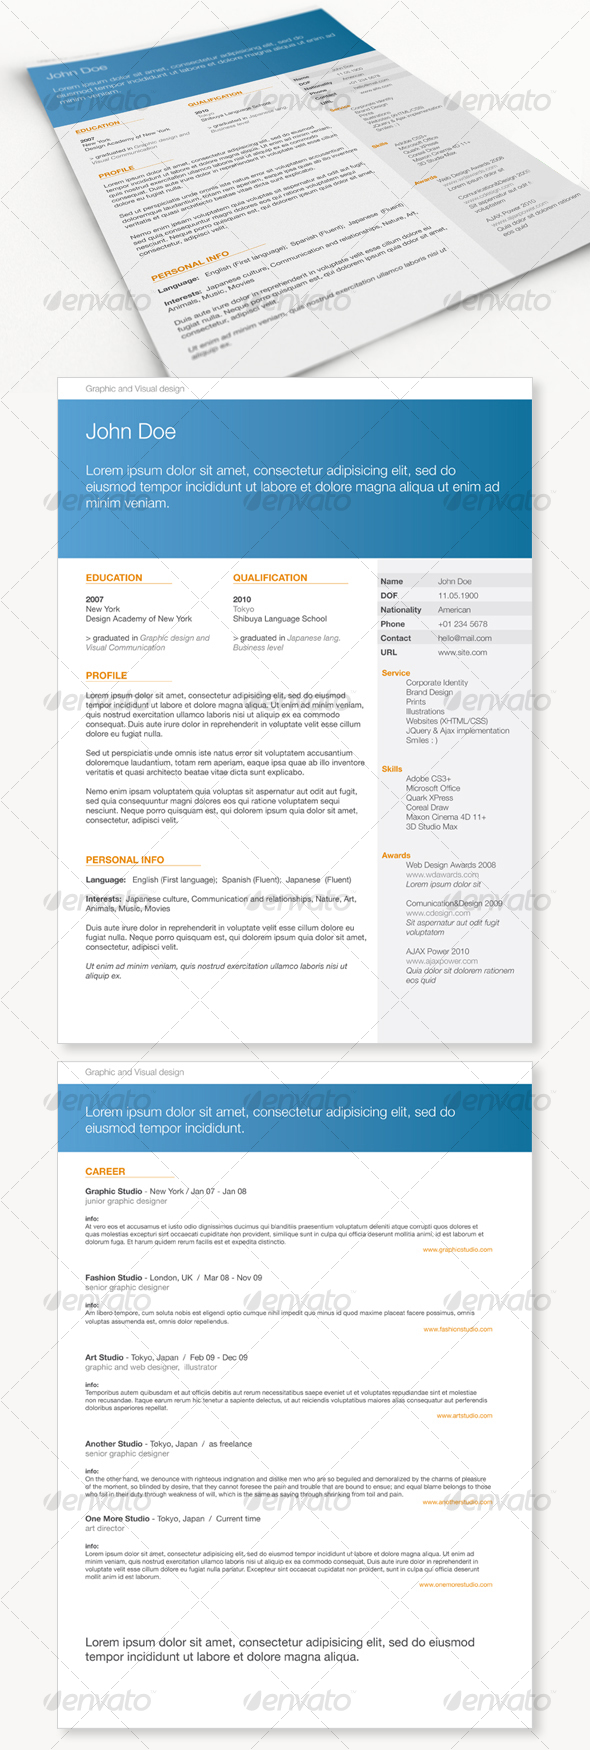 Get Minimal Resume 01